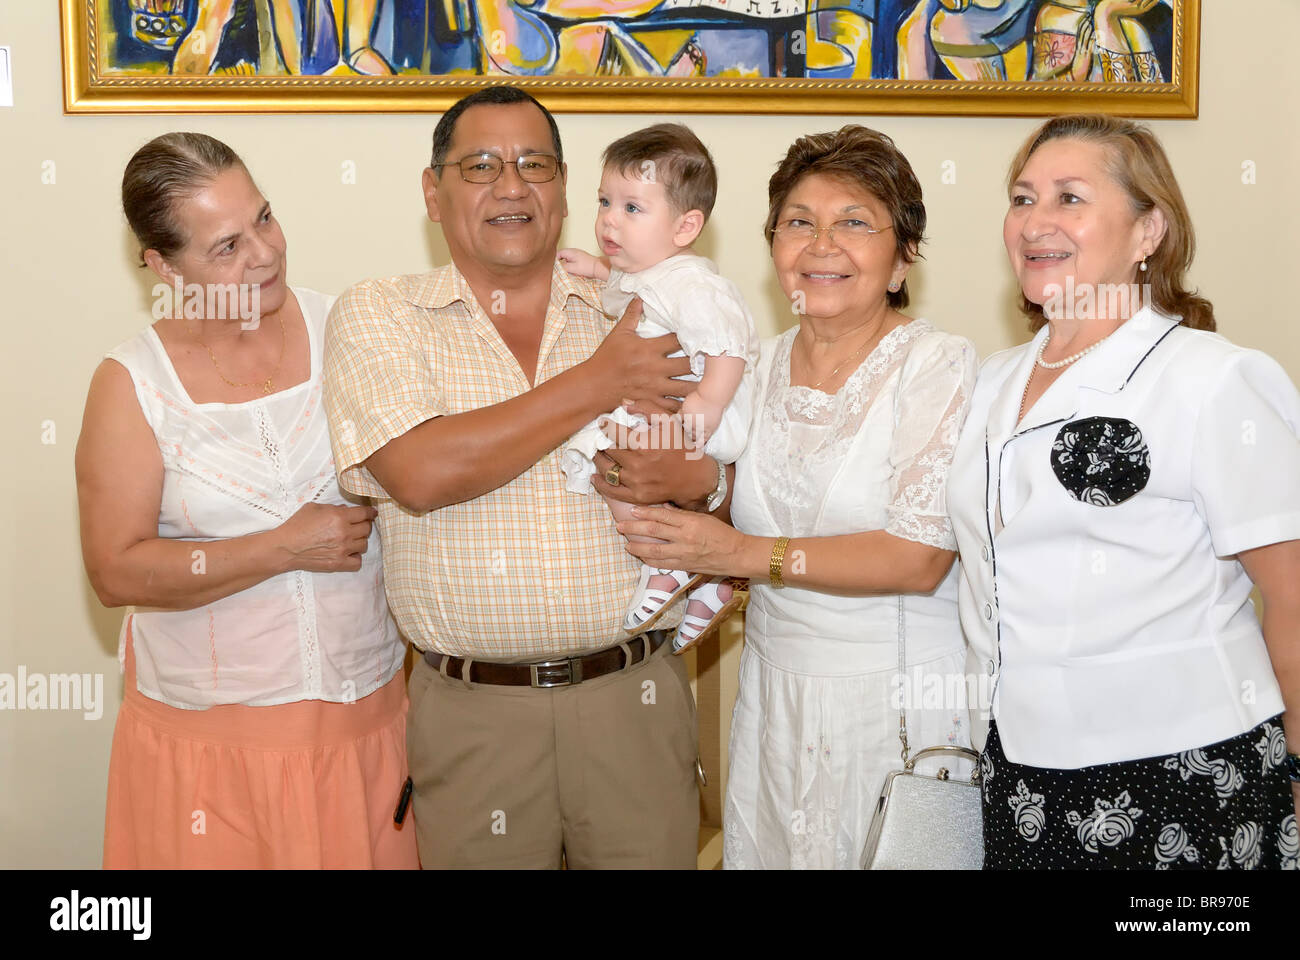 Merida, Yucatan/Mexico-July 8: Baby boy baptism celebration. Family group shot. Relatives and friends - Stock Image